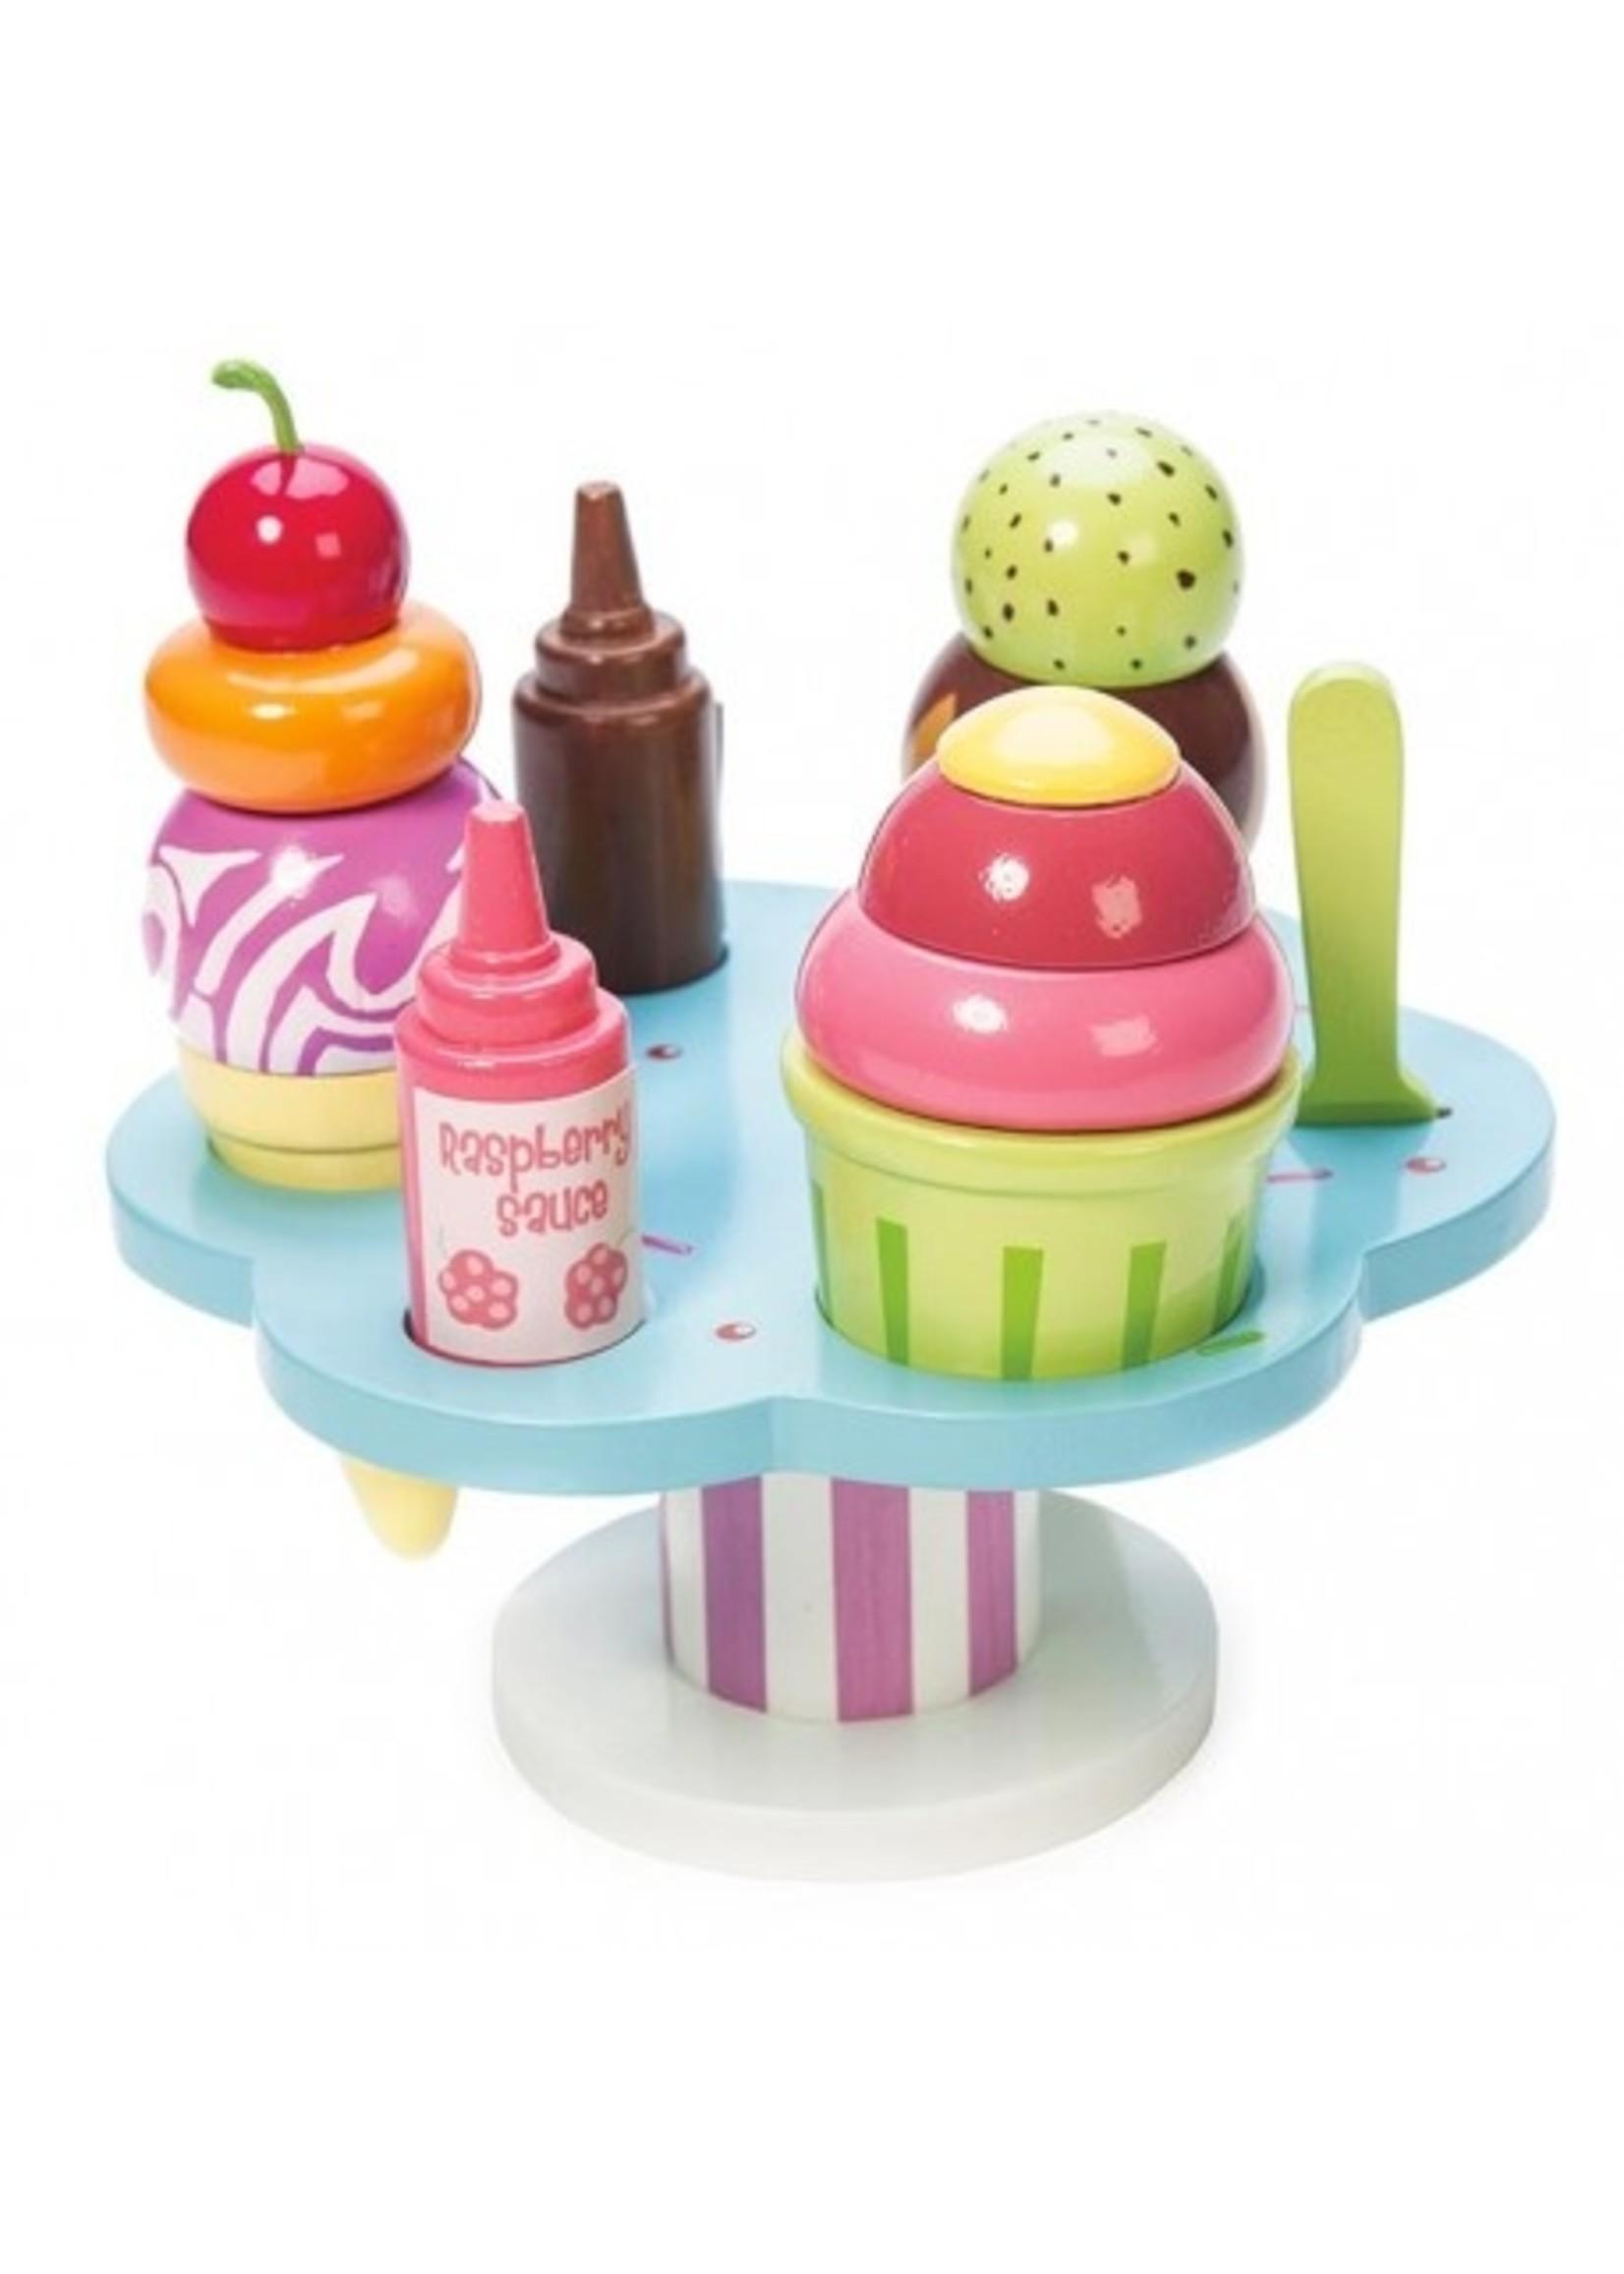 Le Toy Van Les glaces de Carlo